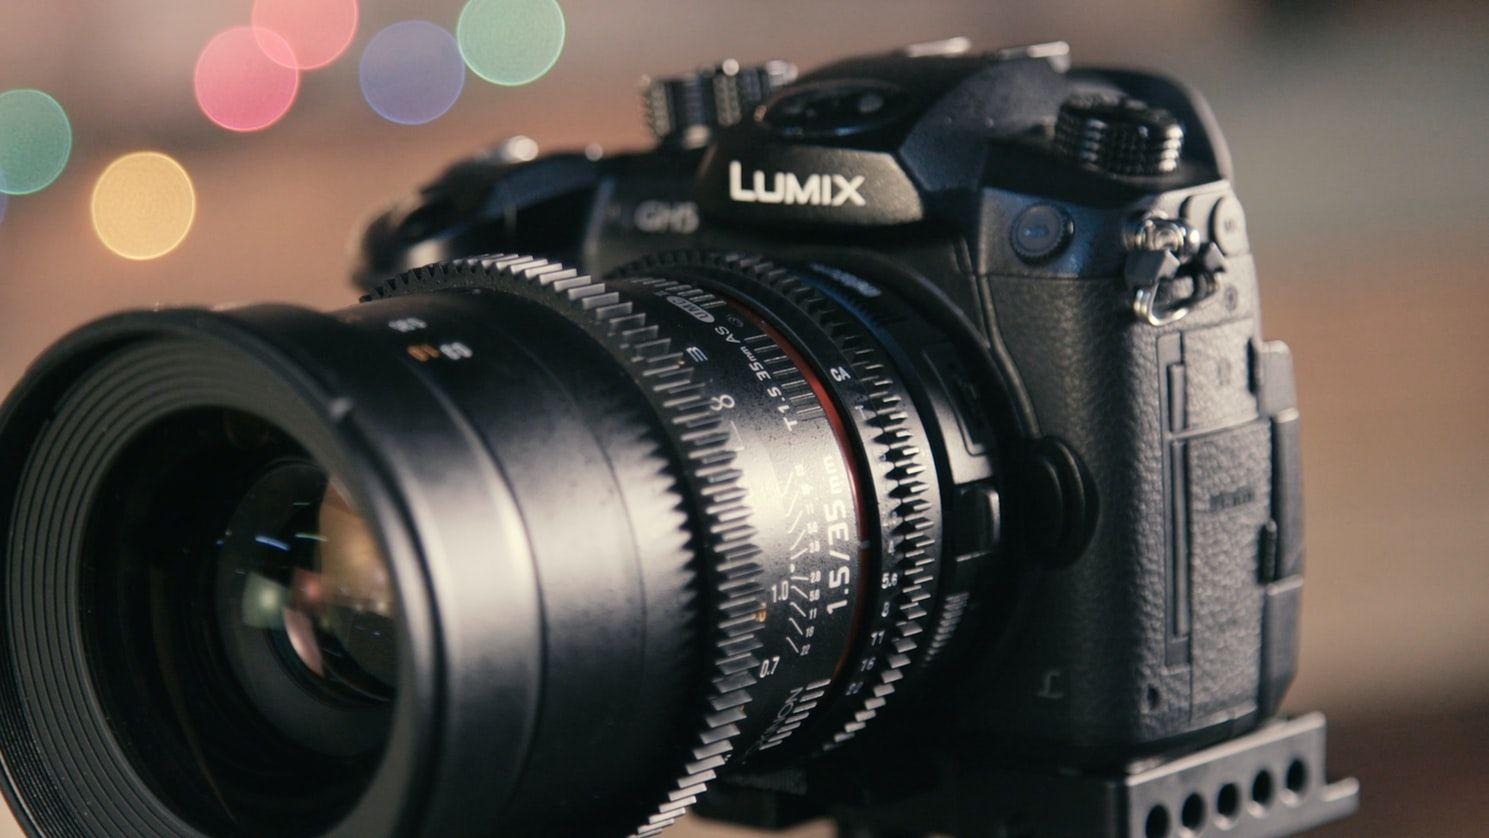 A close up of a camera panasonic lumix gh5 camera and videocamera